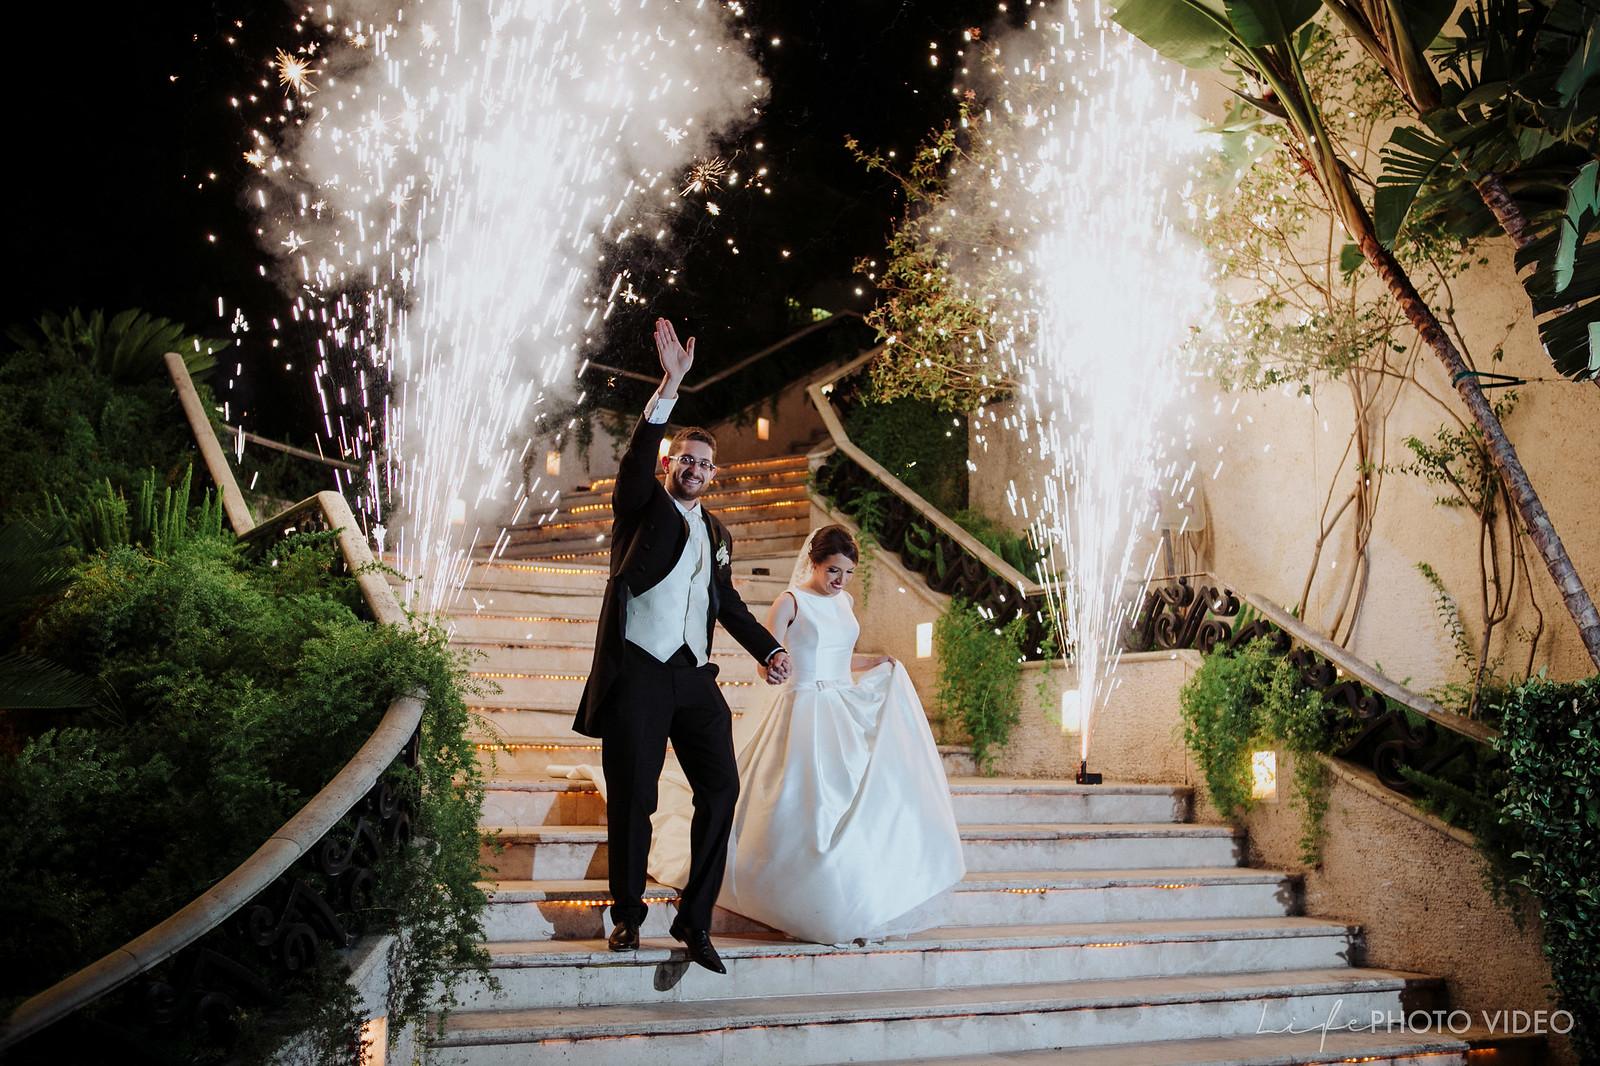 Wedding_Photographer_Guanajuato_067